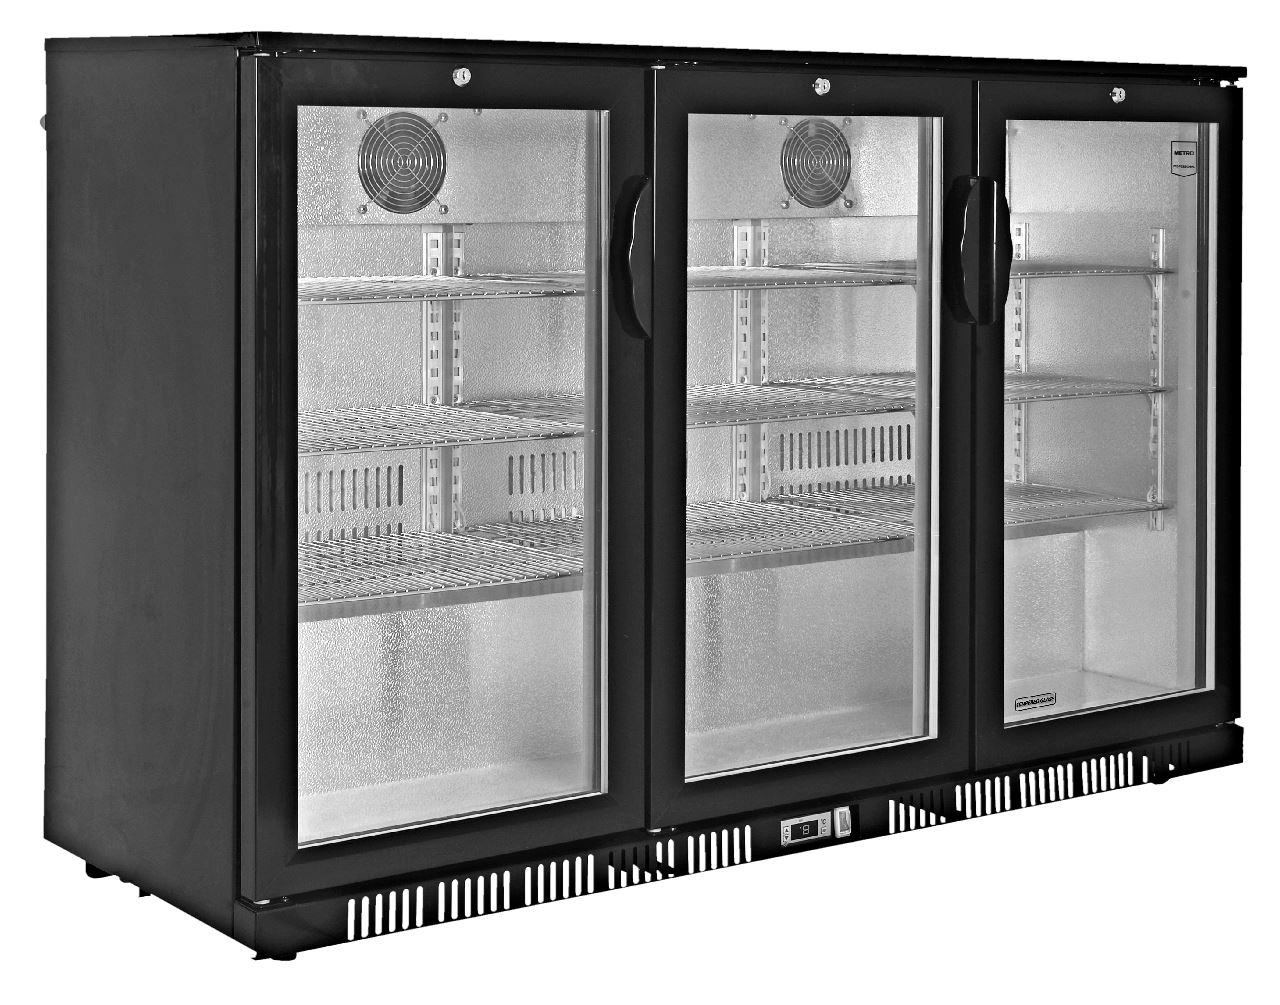 Amica Kühlschrank Metro : Metro professional gg gbc1003 flaschen kühlschrank kühl